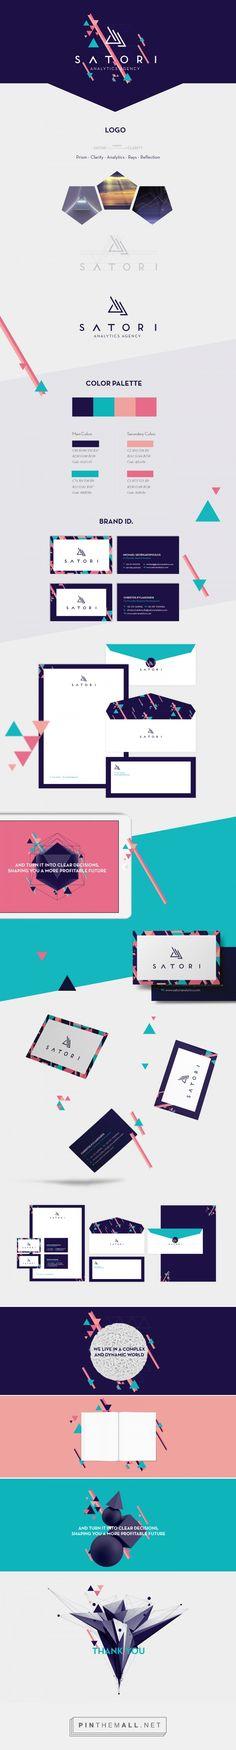 Satori Analytics Agency Branding on Behance | Fivestar Branding – Design and Branding Agency & Inspiration Gallery